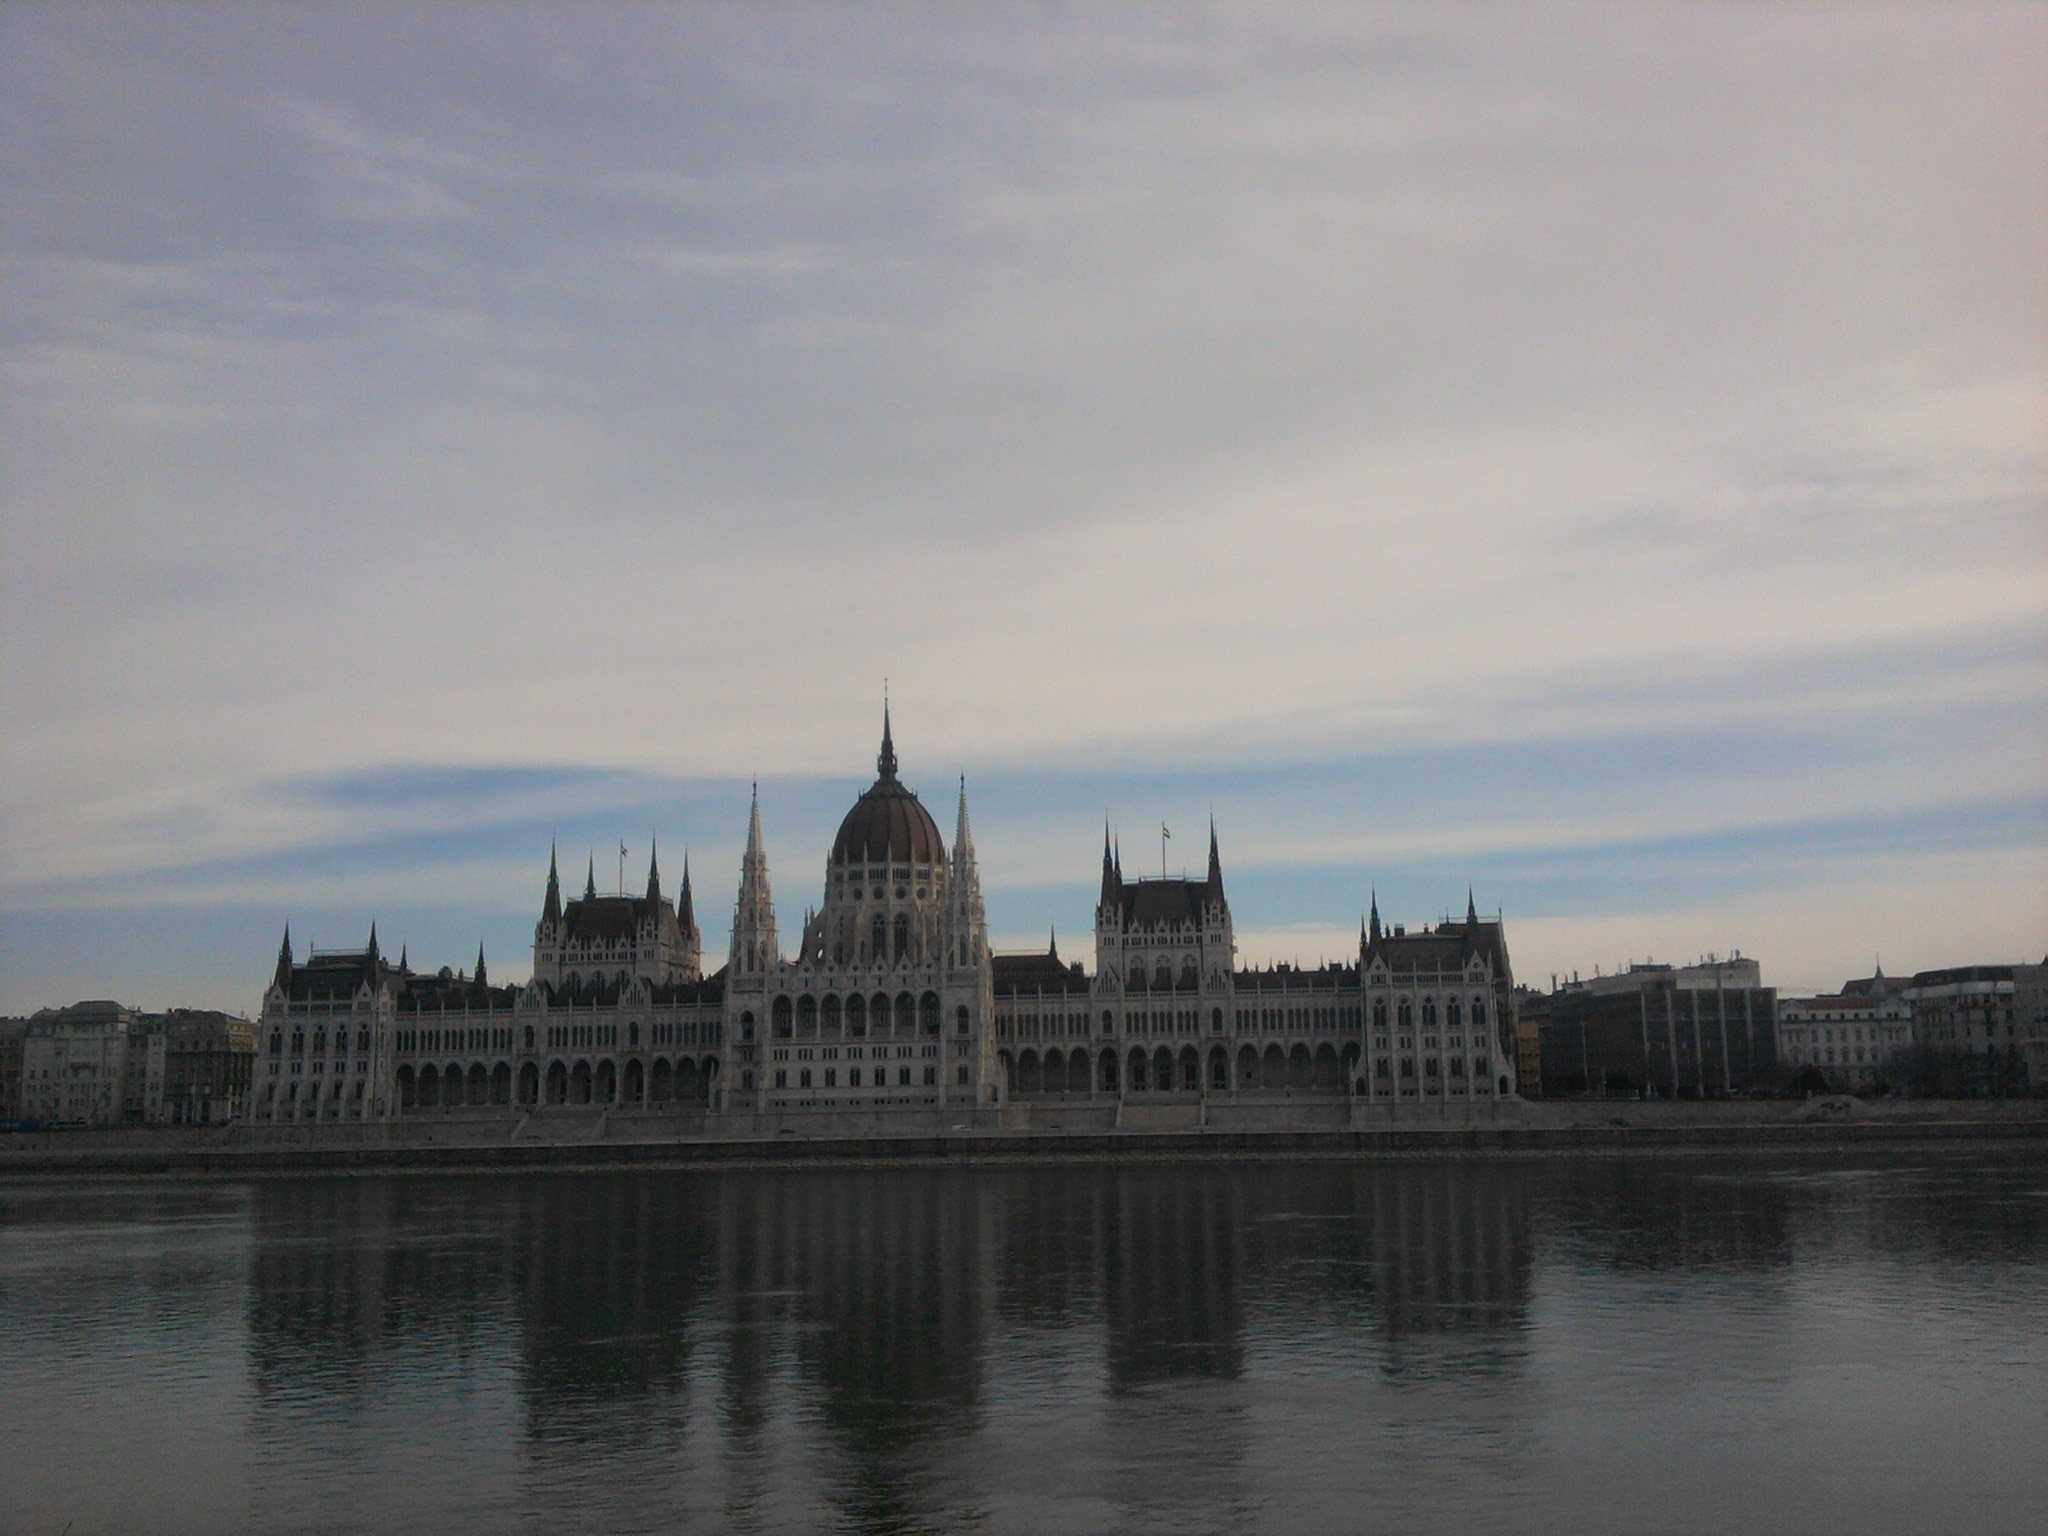 Parlement hongrois au bord du Danube